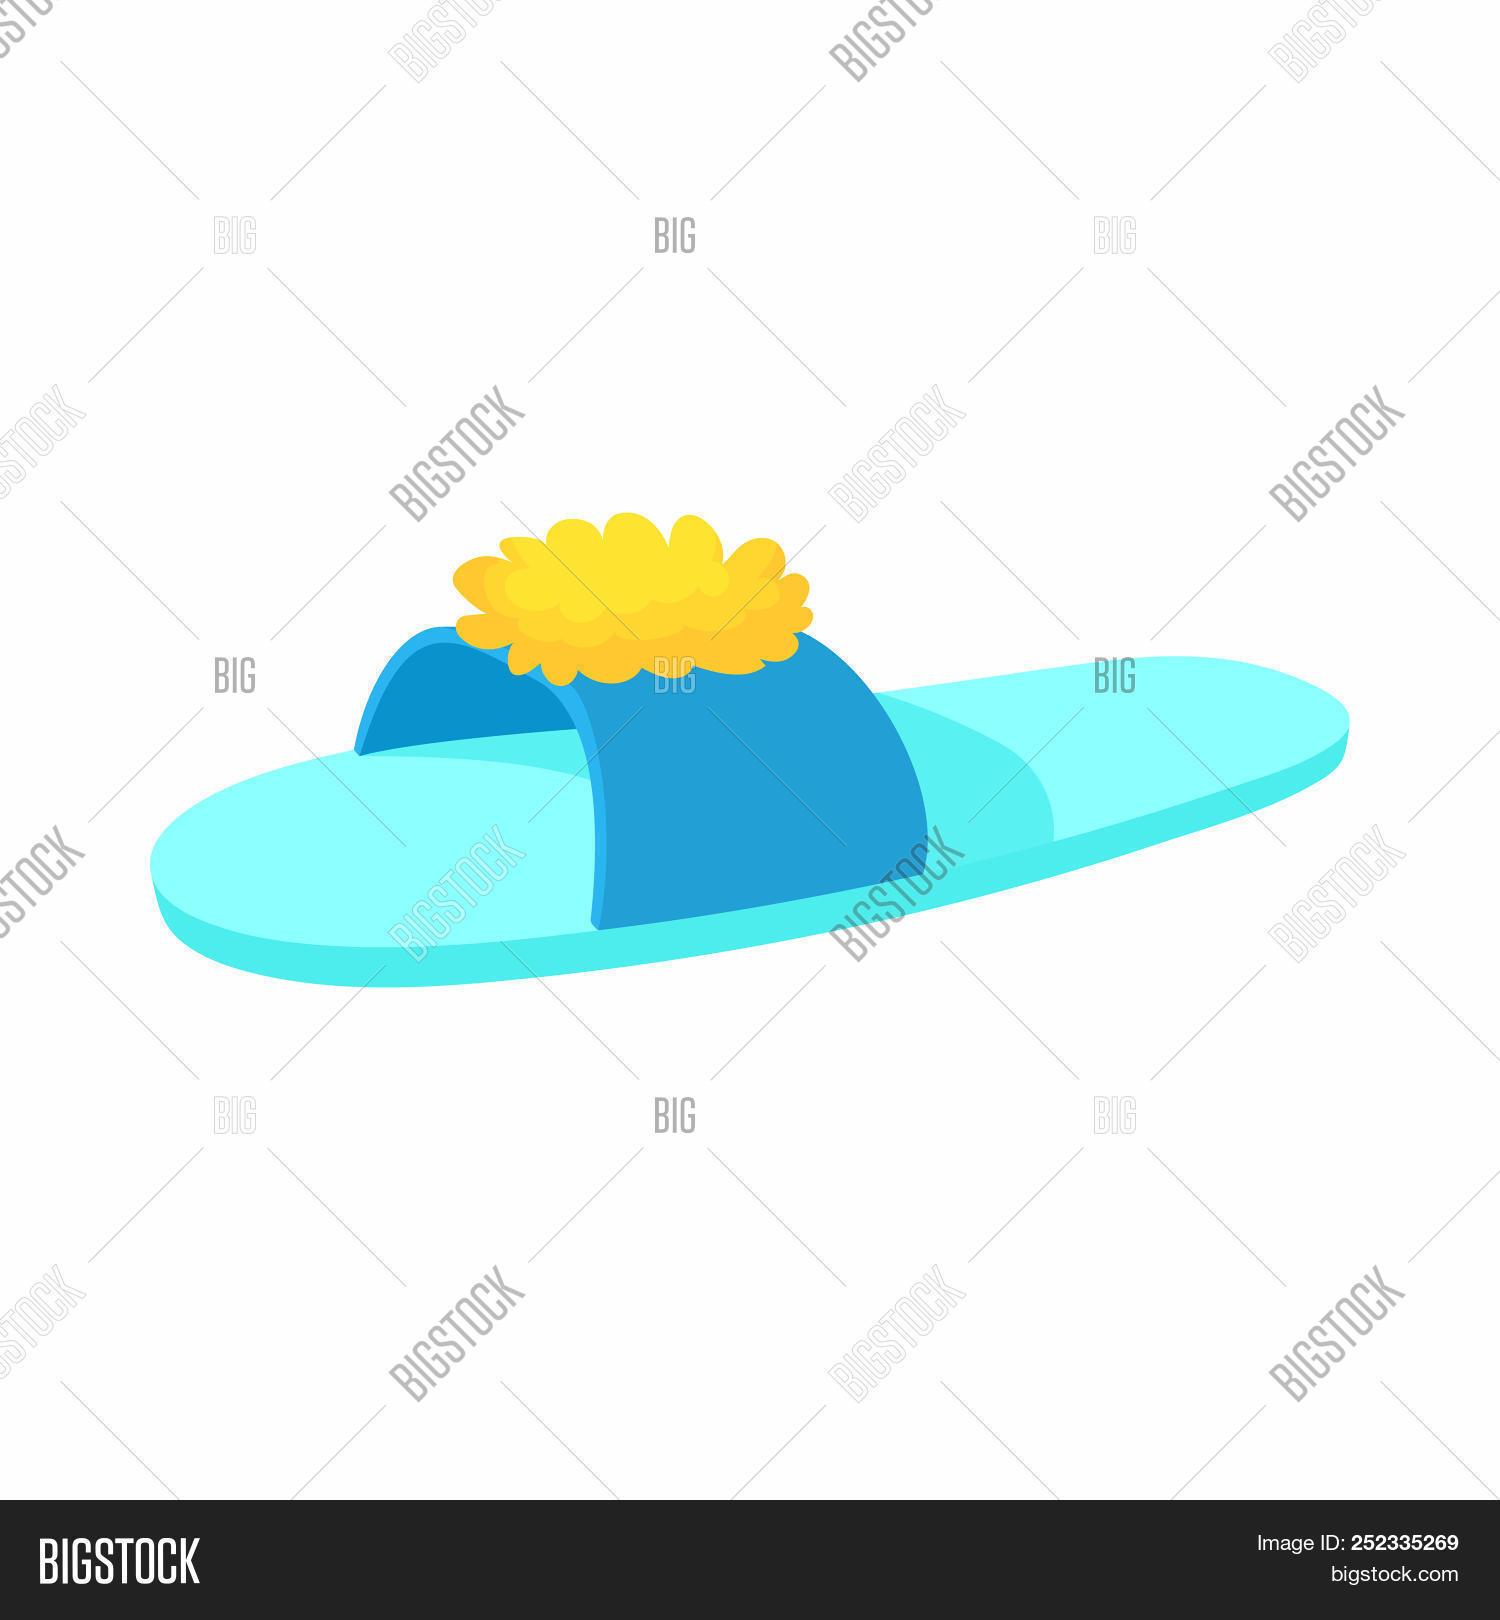 Blue Slipper Yellow Image Photo Free Trial Bigstock